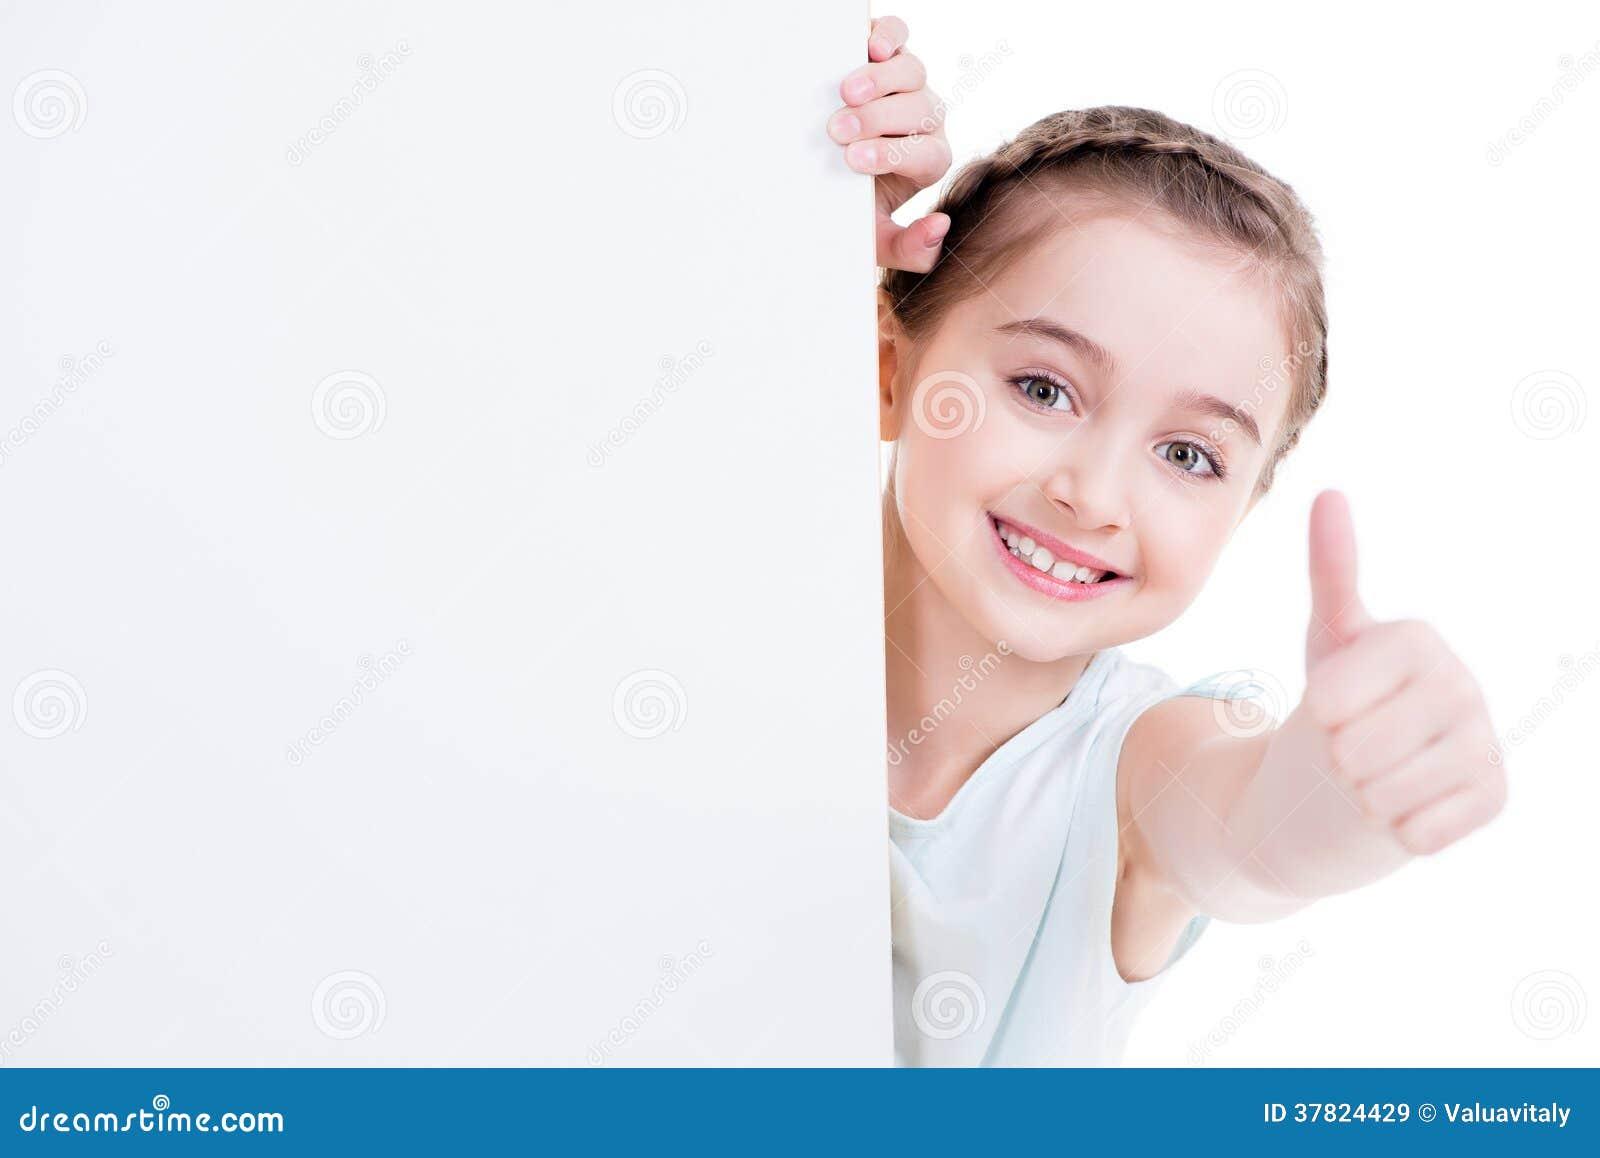 Glimlachend meisje die lege witte banner houden.